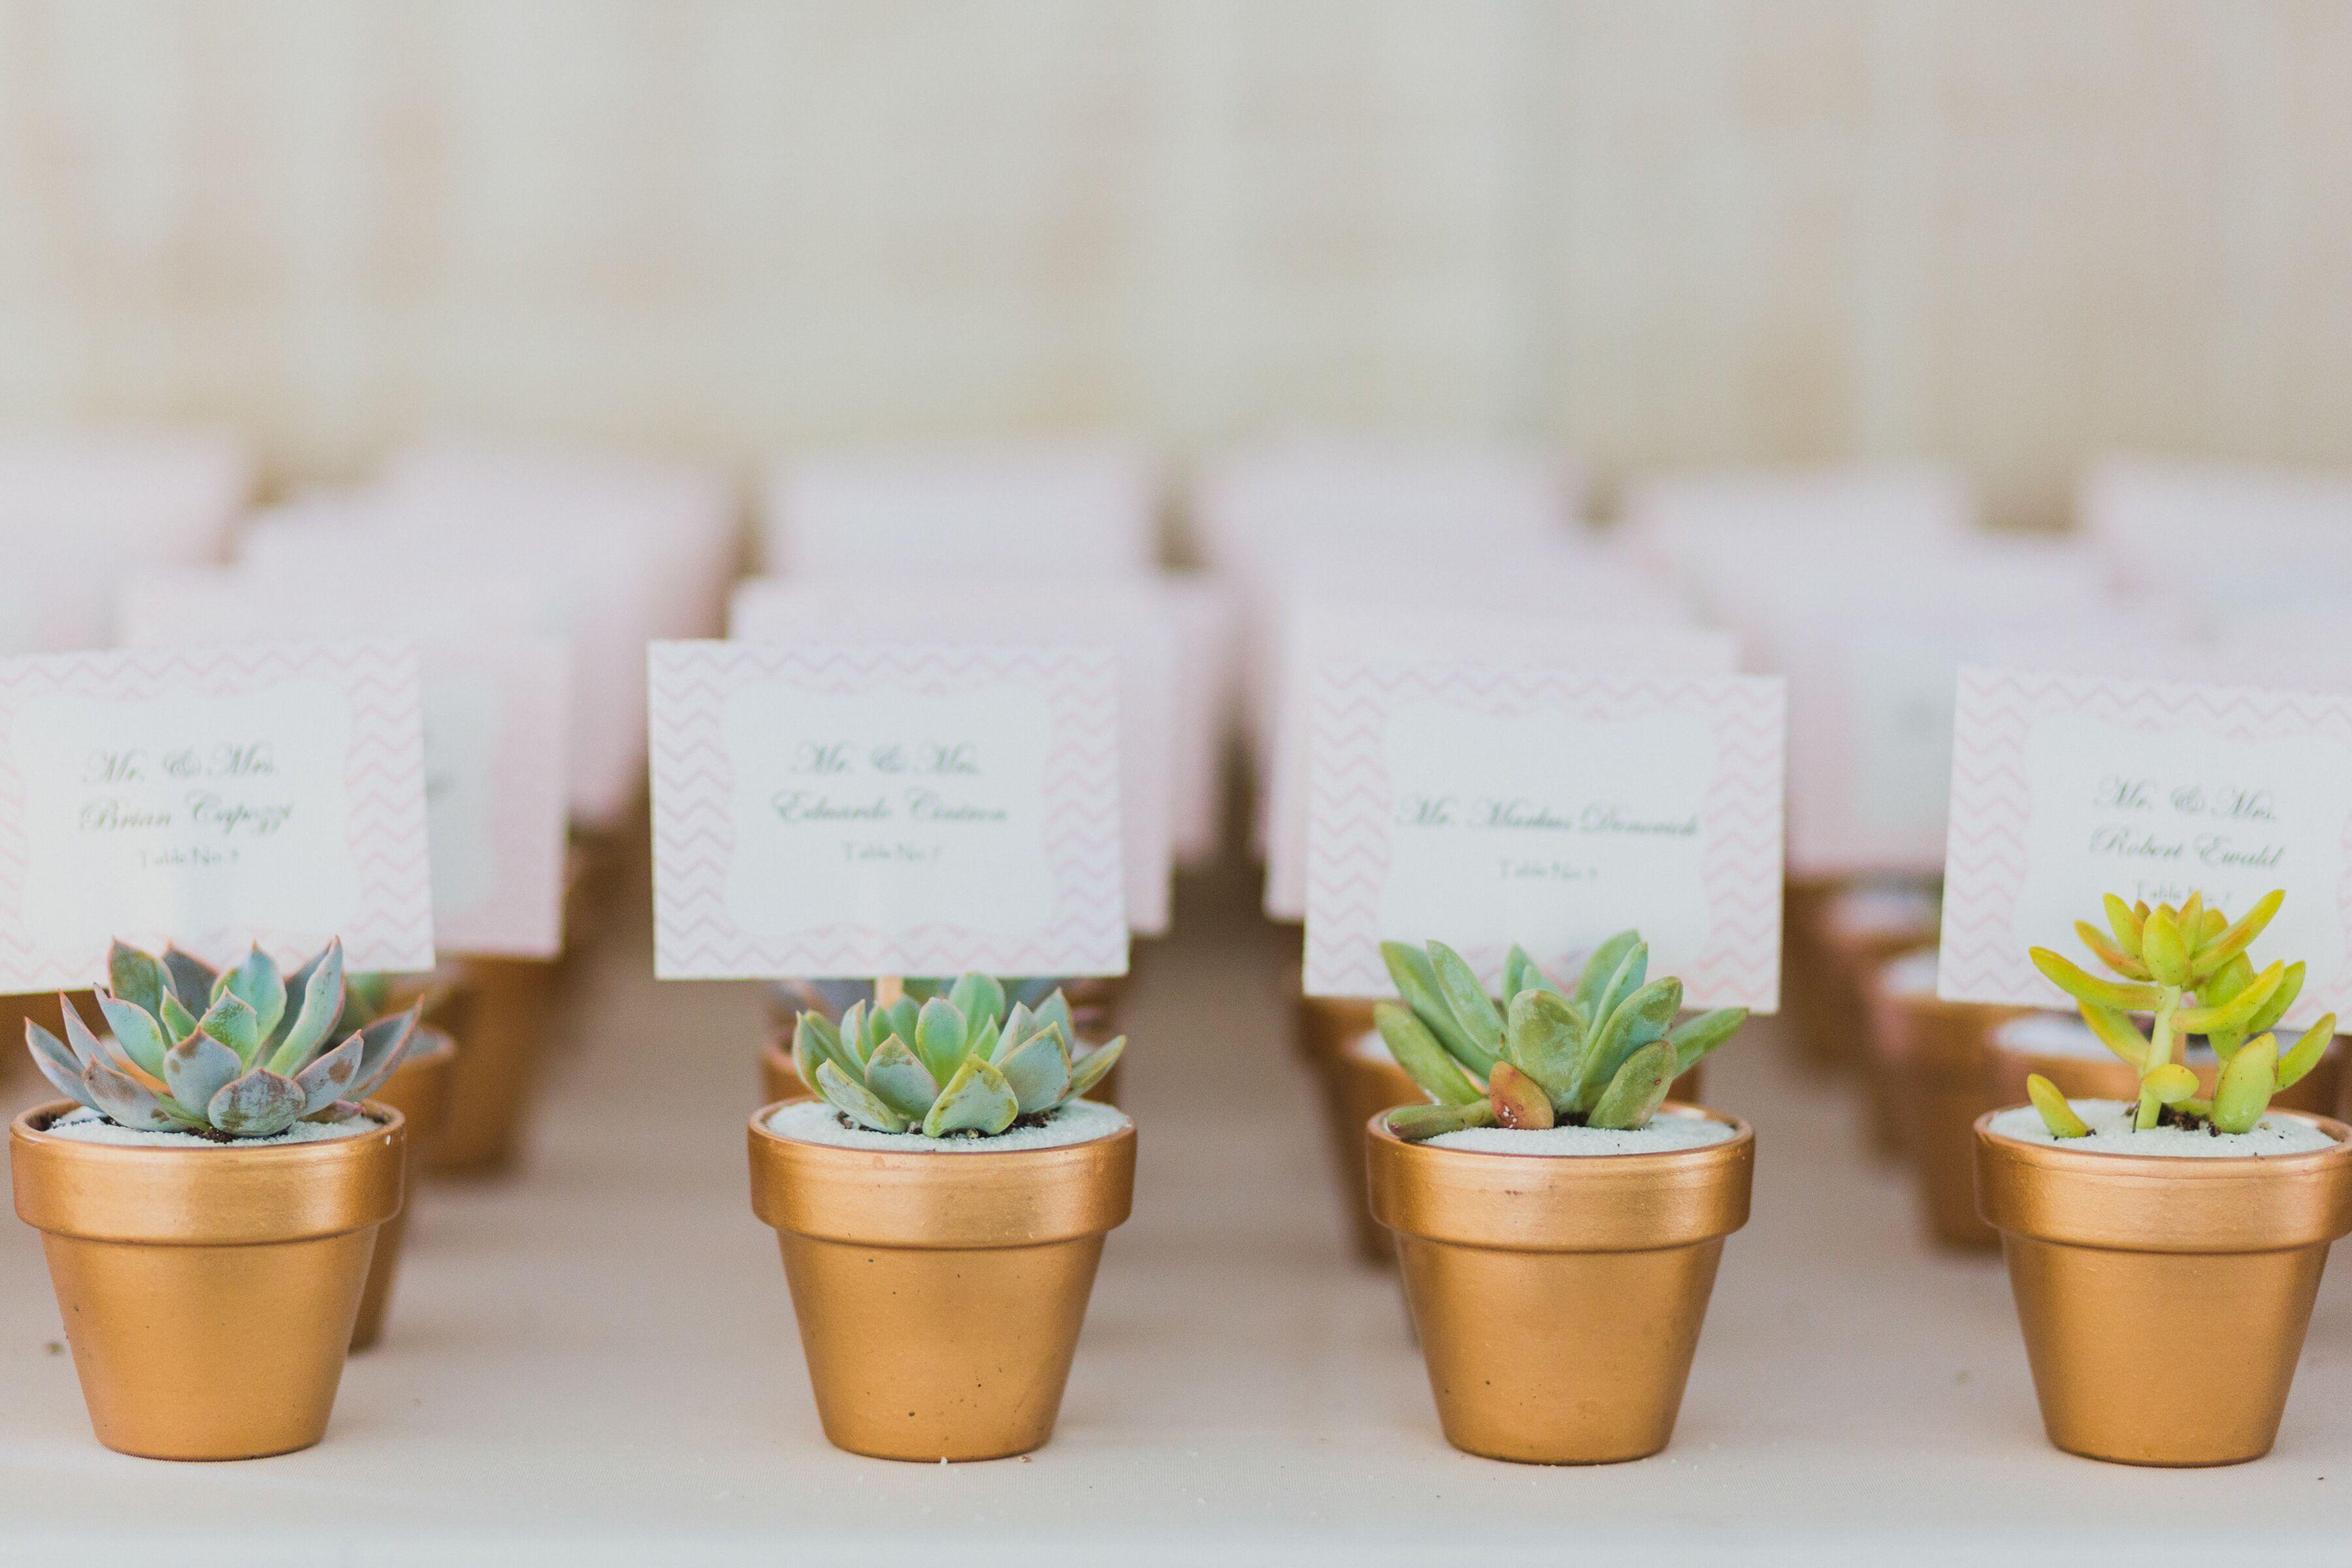 Succulent Escort Cards in Gold Pots